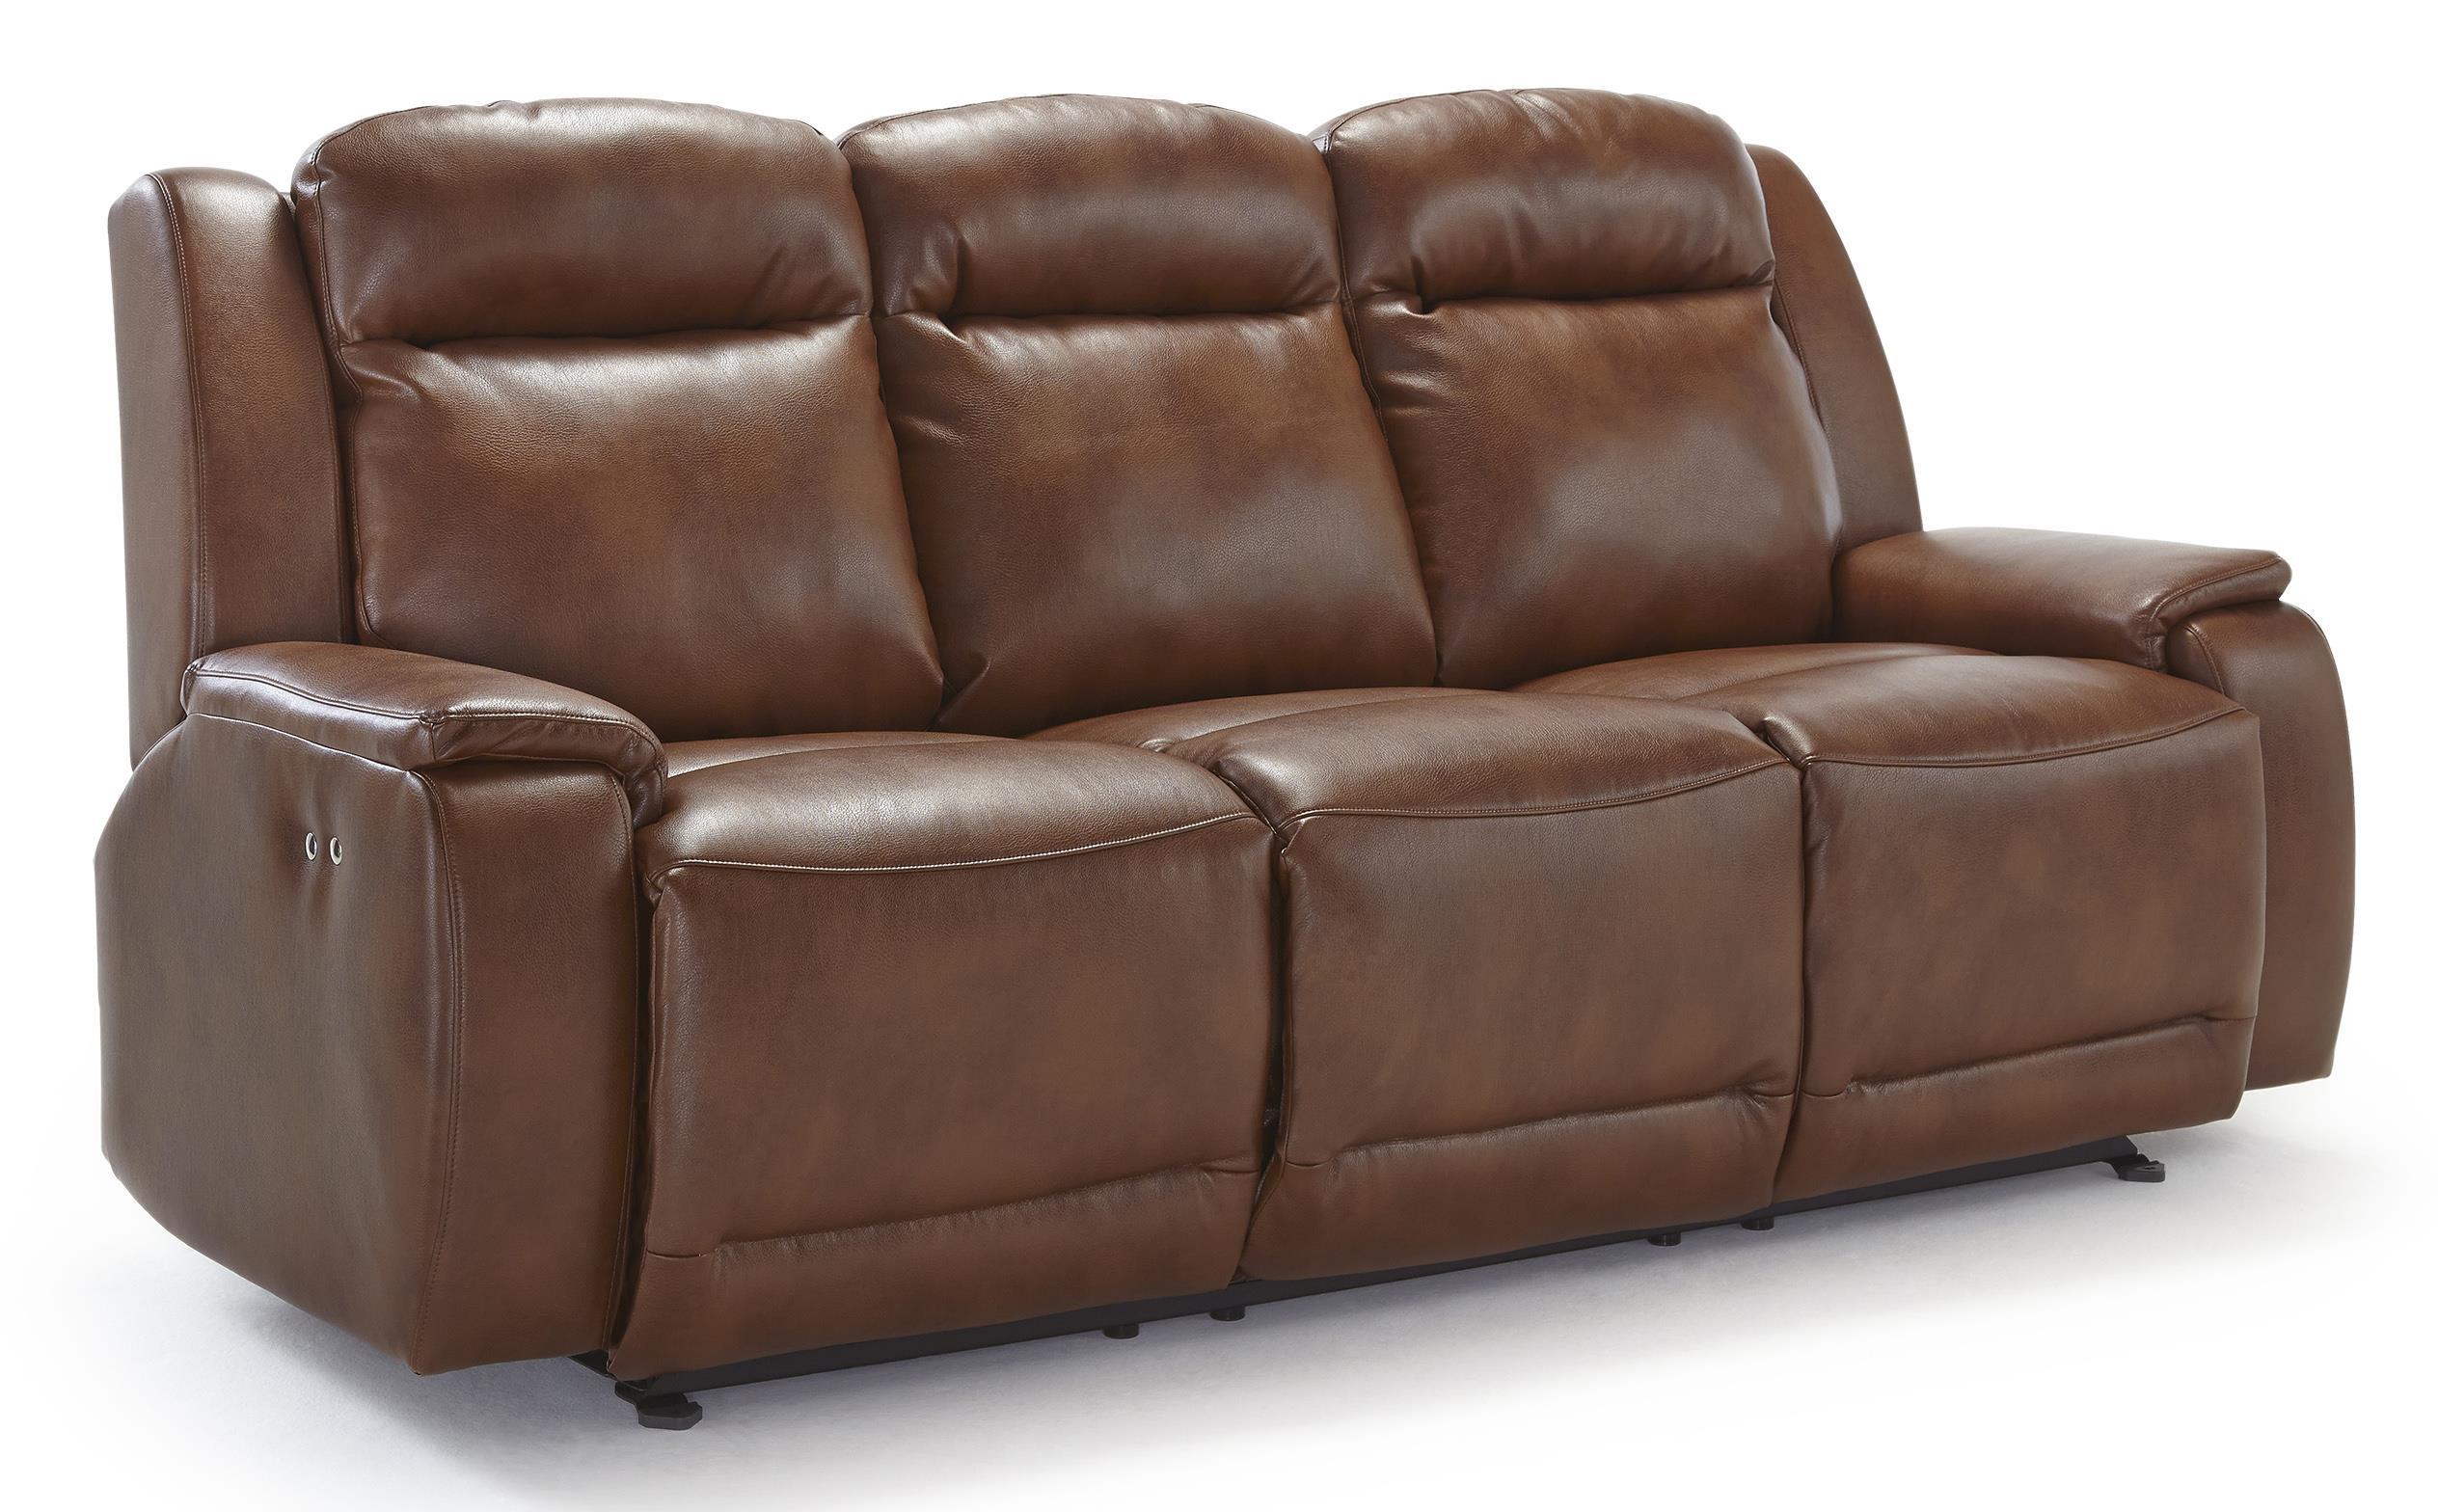 best memory foam sleeper sofas fulton tan microfiber convertible sofa bed home furnishings hardisty casual power reclining